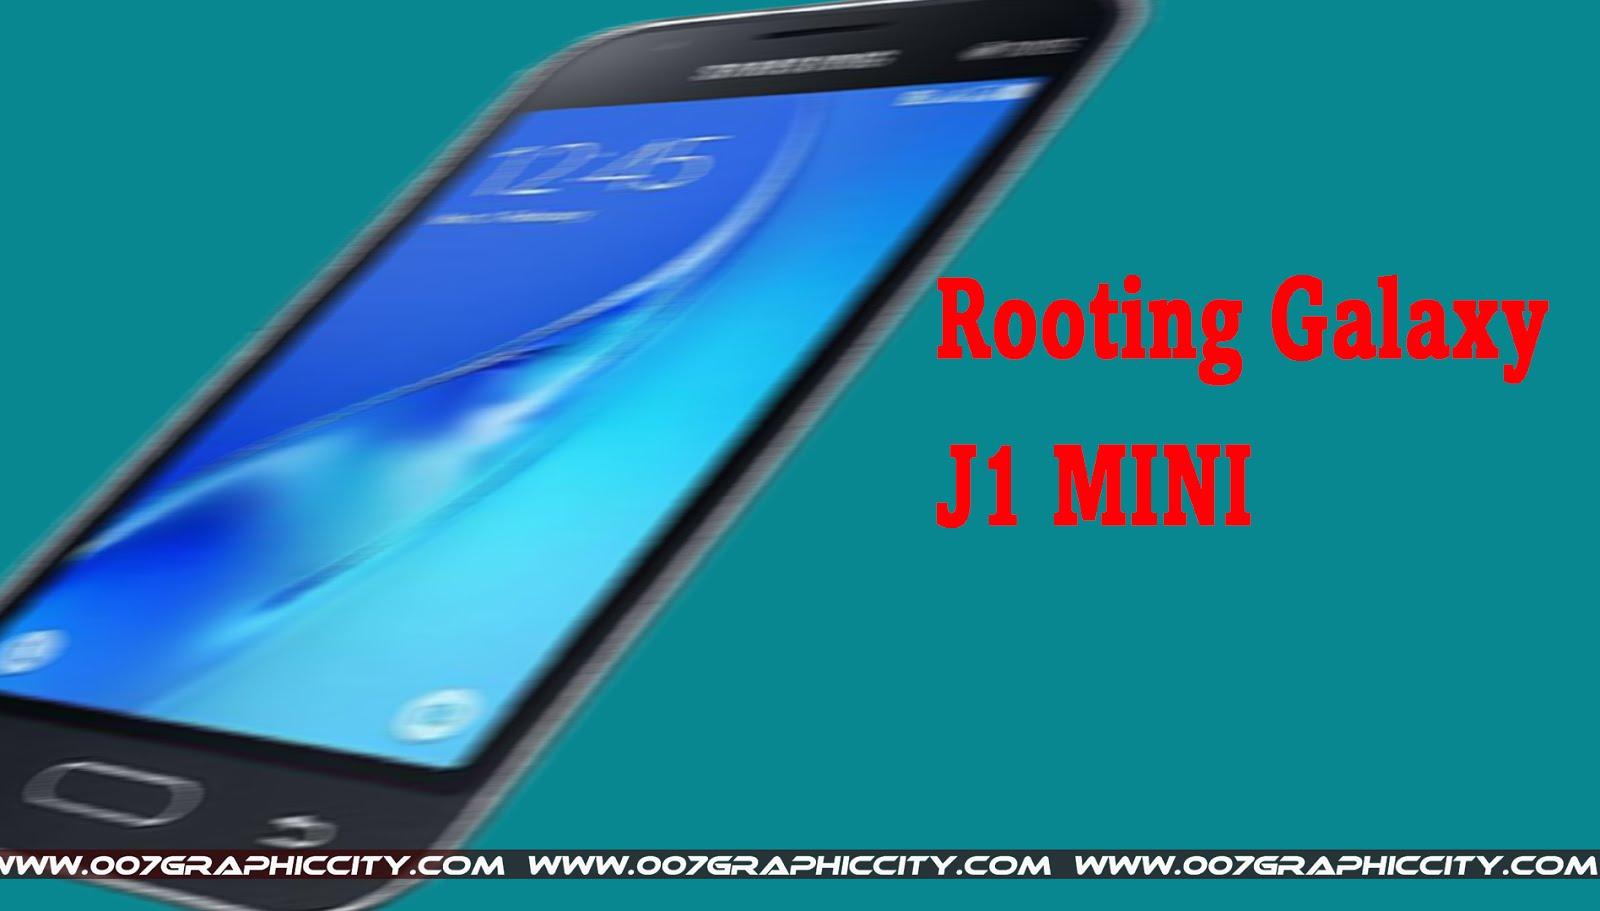 root j1 mini